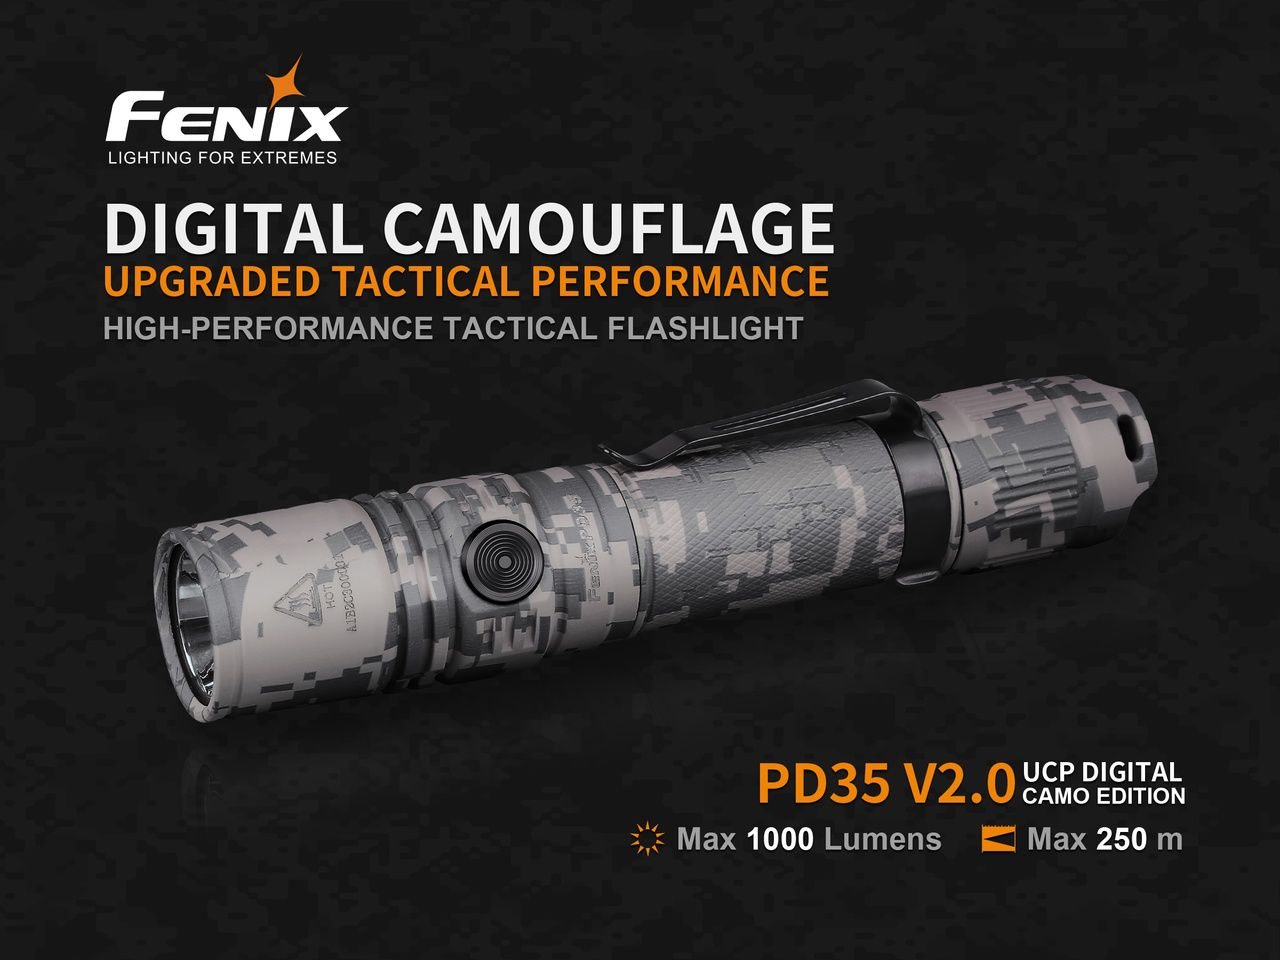 Lanterna Tática Fenix PD35 V2.0 Camo - 1000 Lumens